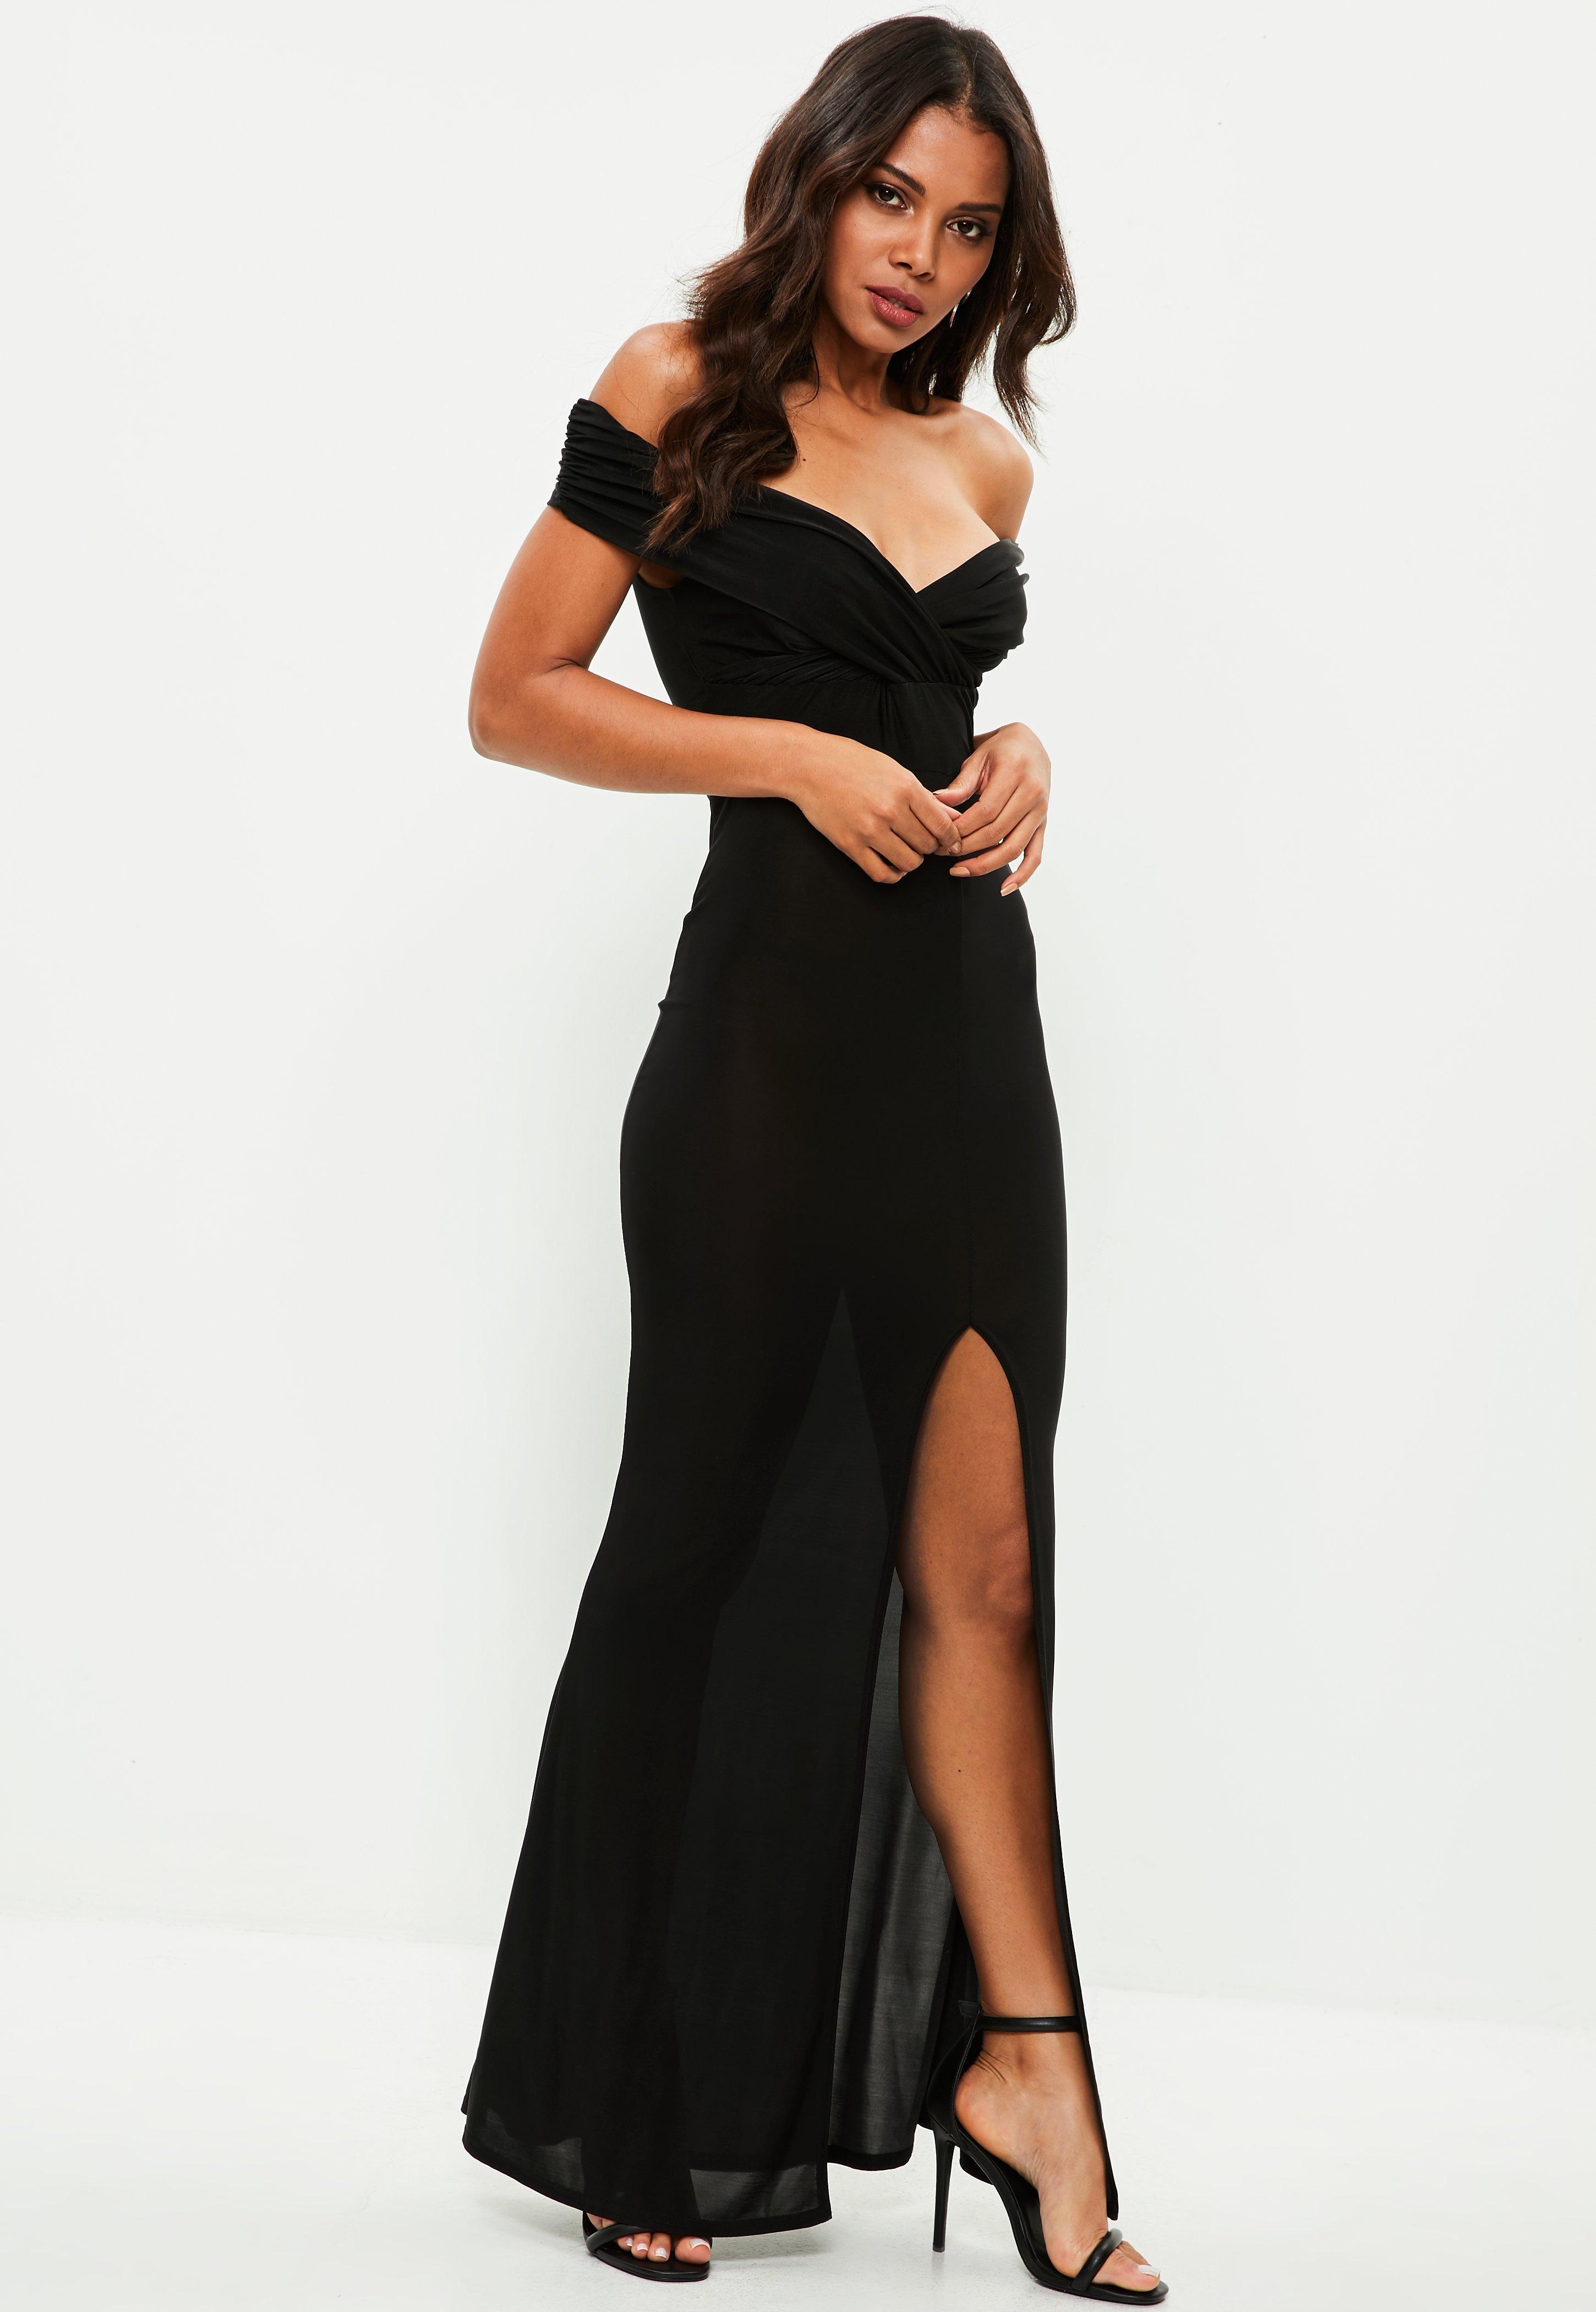 Lyst - Missguided Black Slinky Bardot Wrap Front Split Maxi Dress in ... 87d9f0350